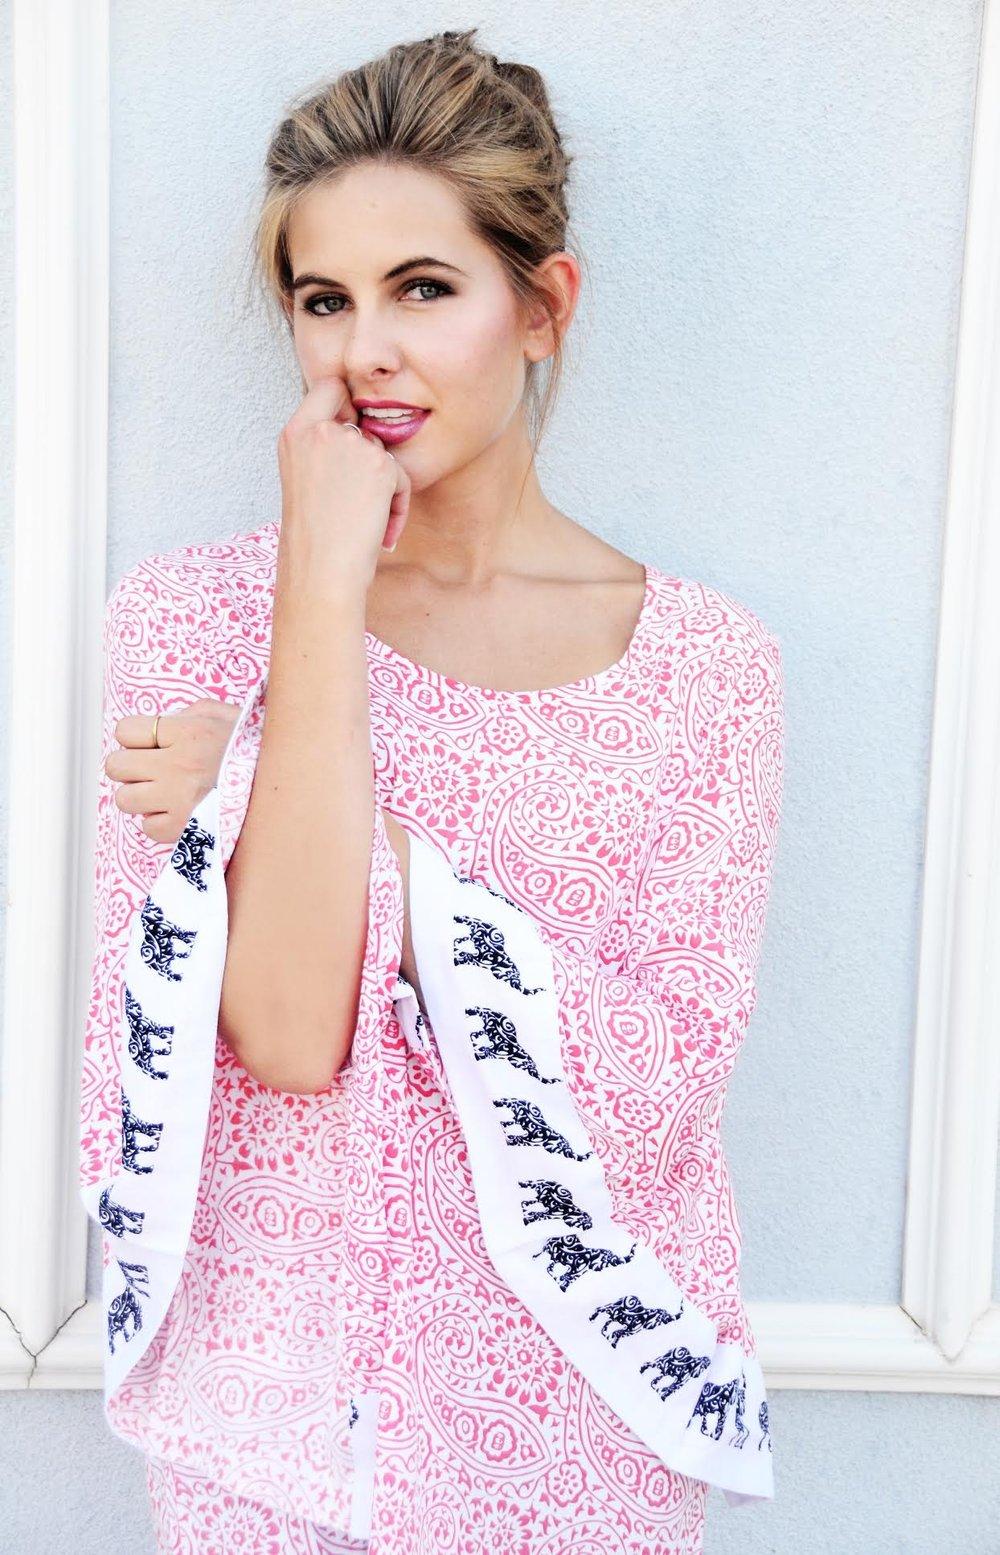 HAIR + MAKEUP: Harley Ann Artistry | MODEL: Brooke Wood | PHOTO: Julia Ka | CLOTHING: Misha Mendicino Designs